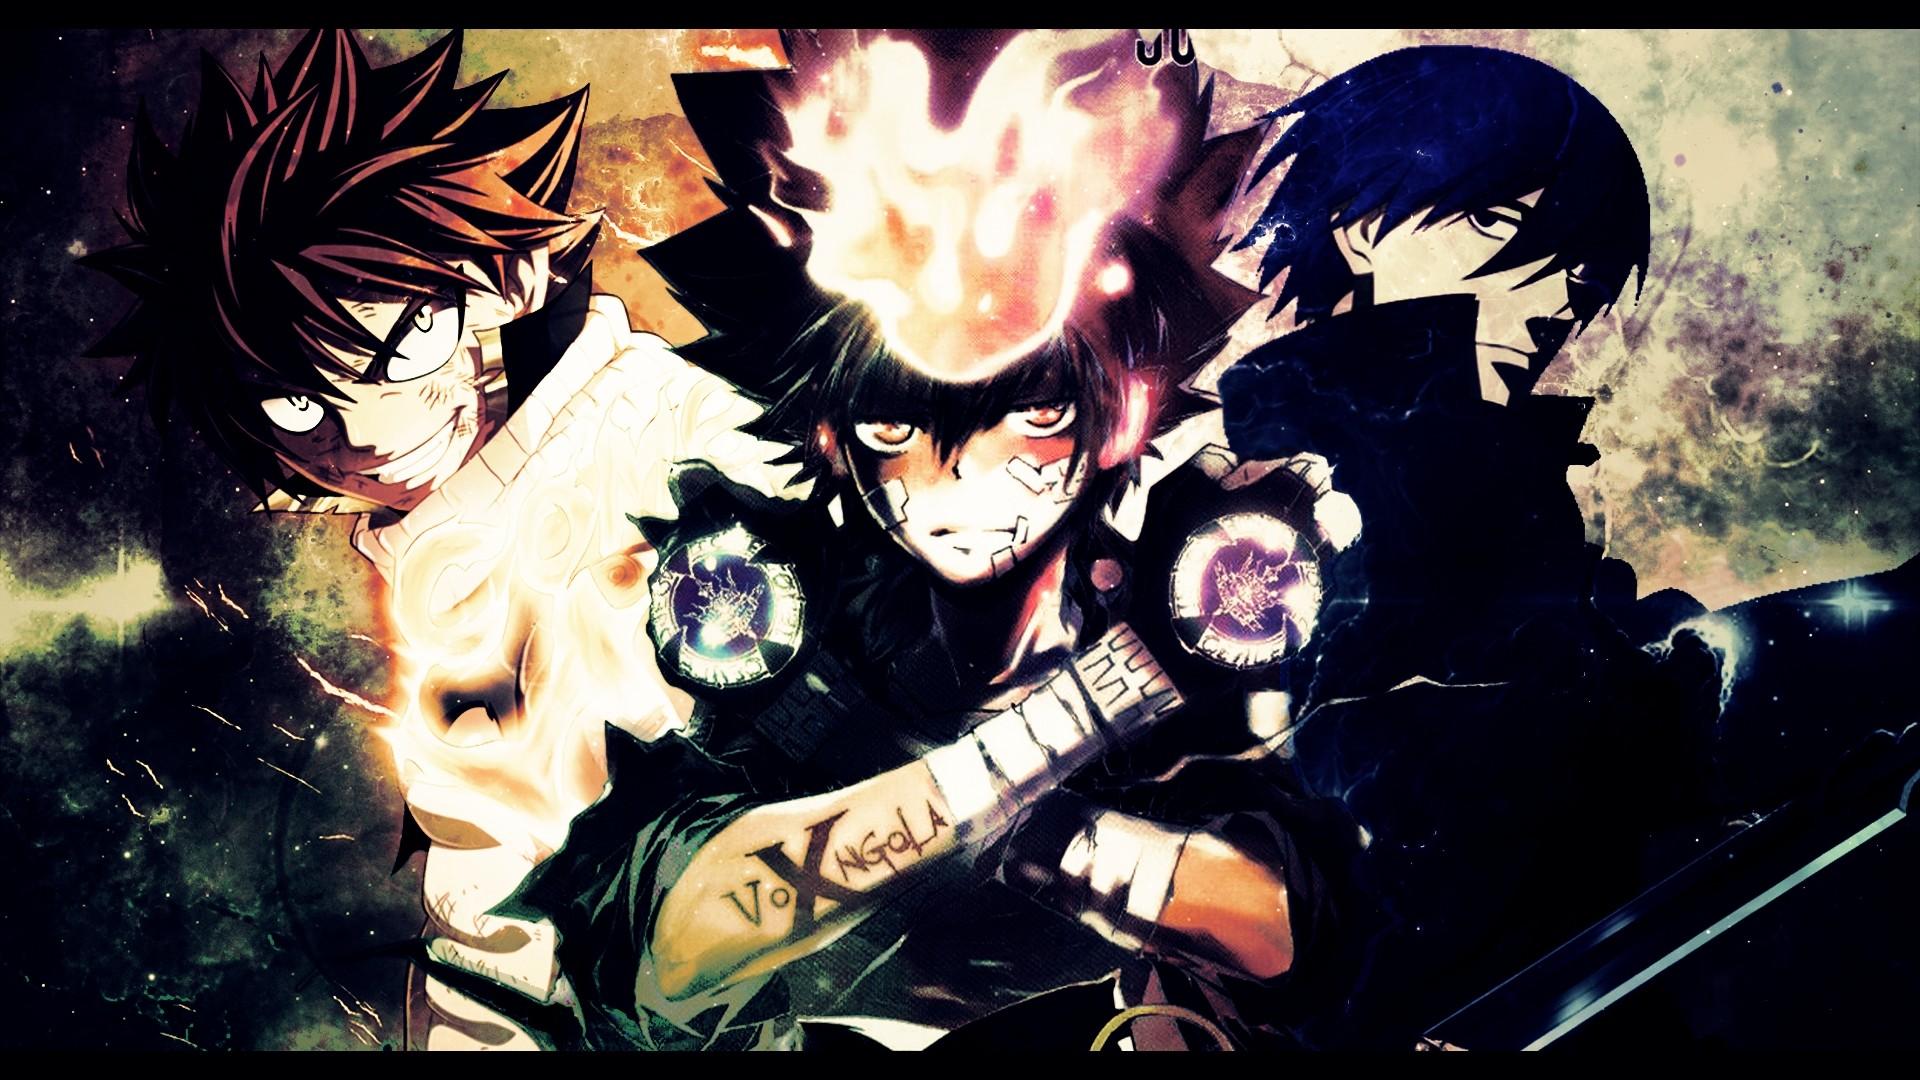 Anime Artwork Darker Than Black Dragneel Natsu Fairy Tail Flames Katekyo  Hitman Reborn